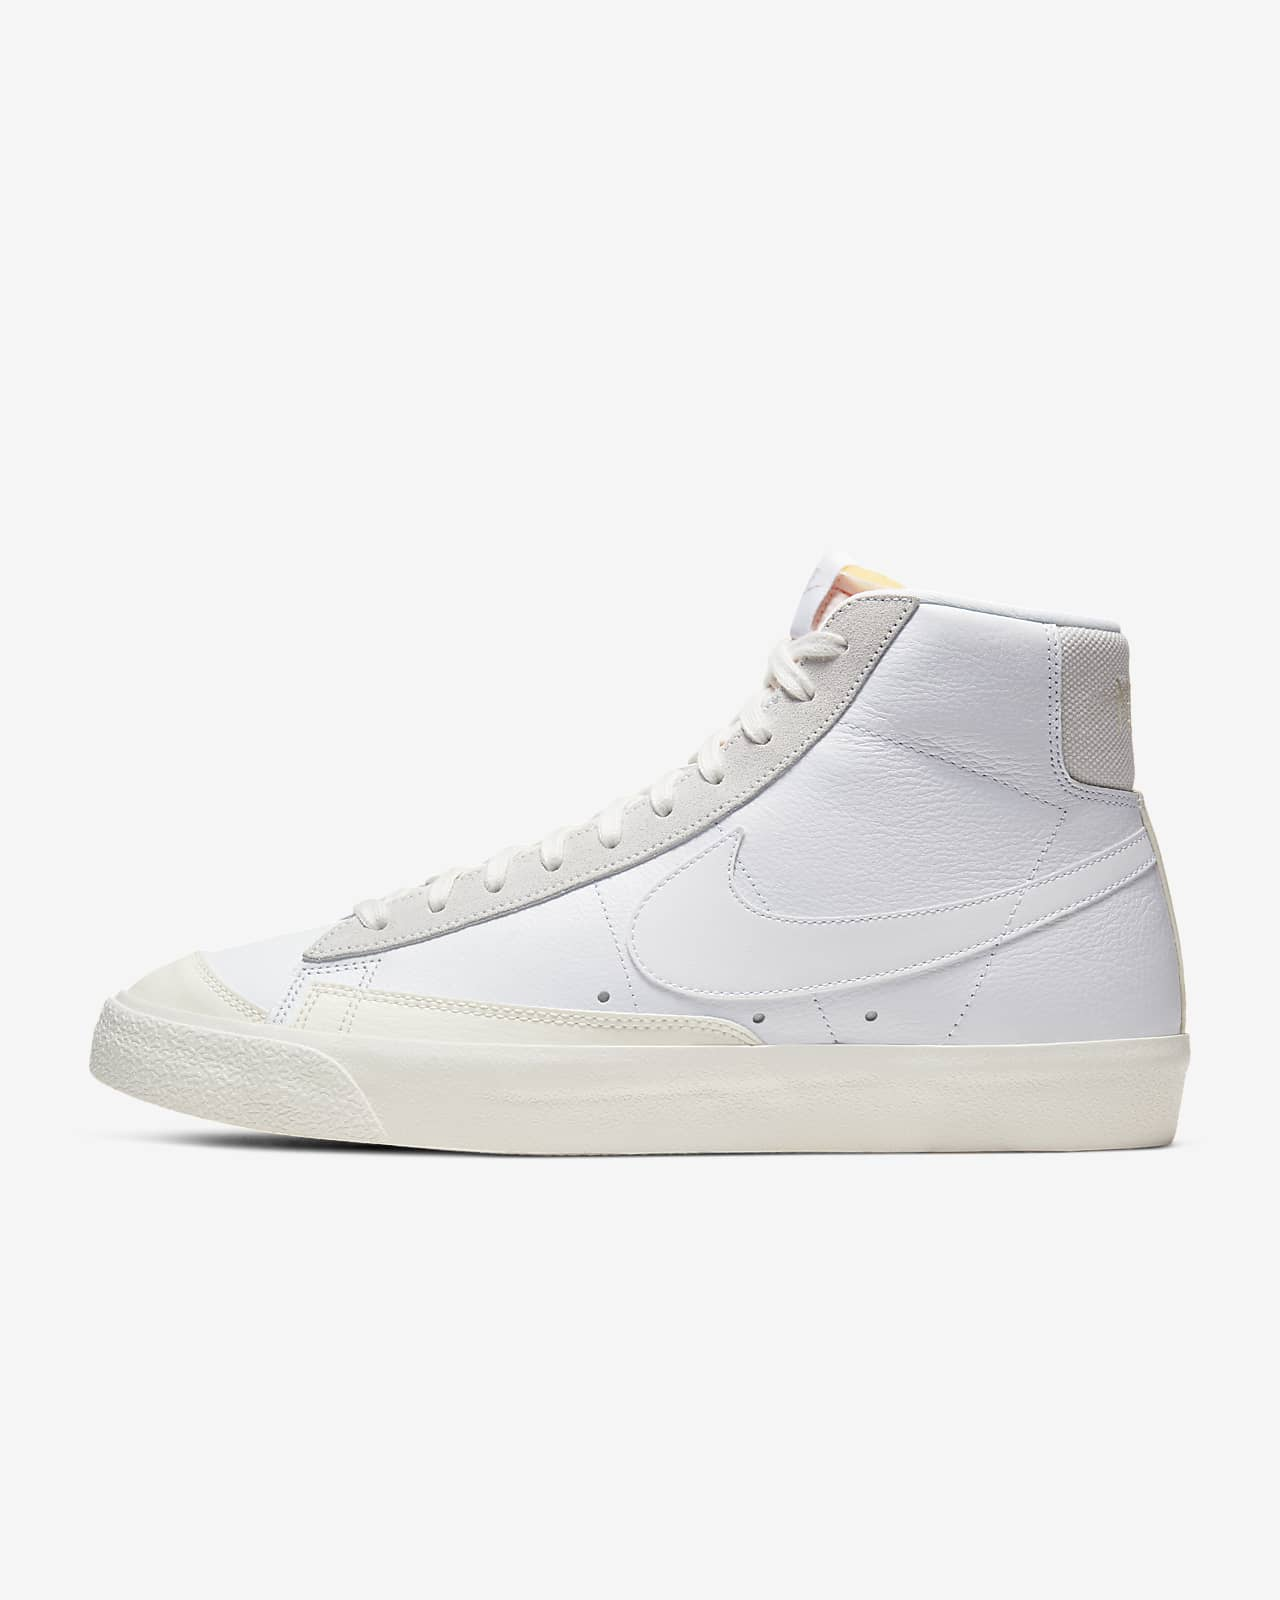 loco Excepcional cepillo  Nike Blazer Mid Vintage '77 Men's Shoe. Nike LU